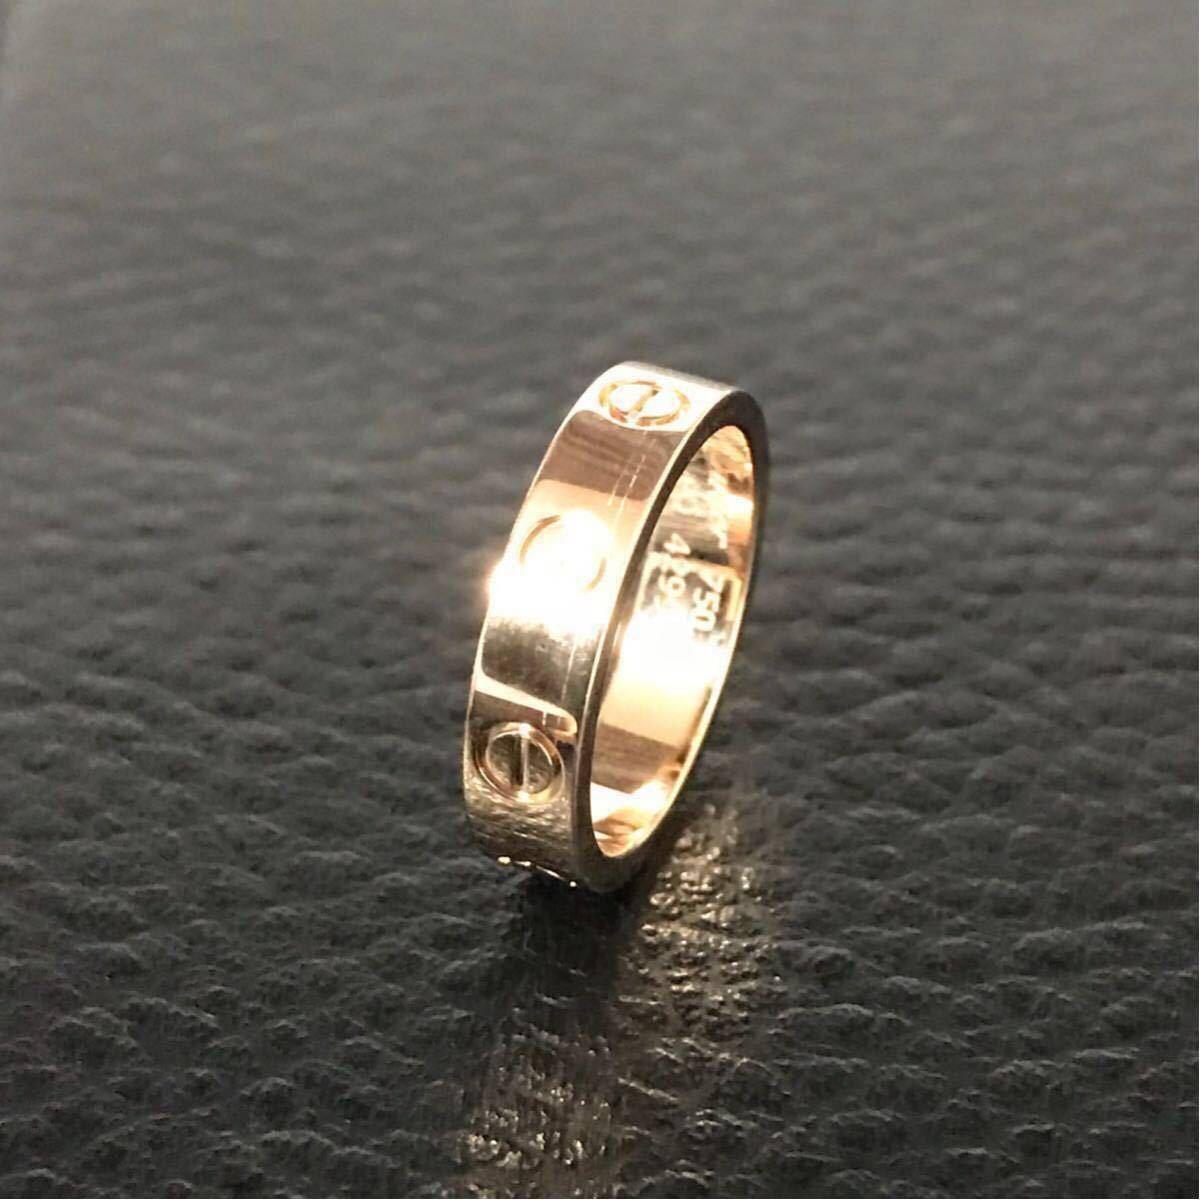 Cartier★カルティエ ラブリング★K18PG 1p ダイヤモンドリング 46 指輪 ウエディング ピンクゴールド_画像5